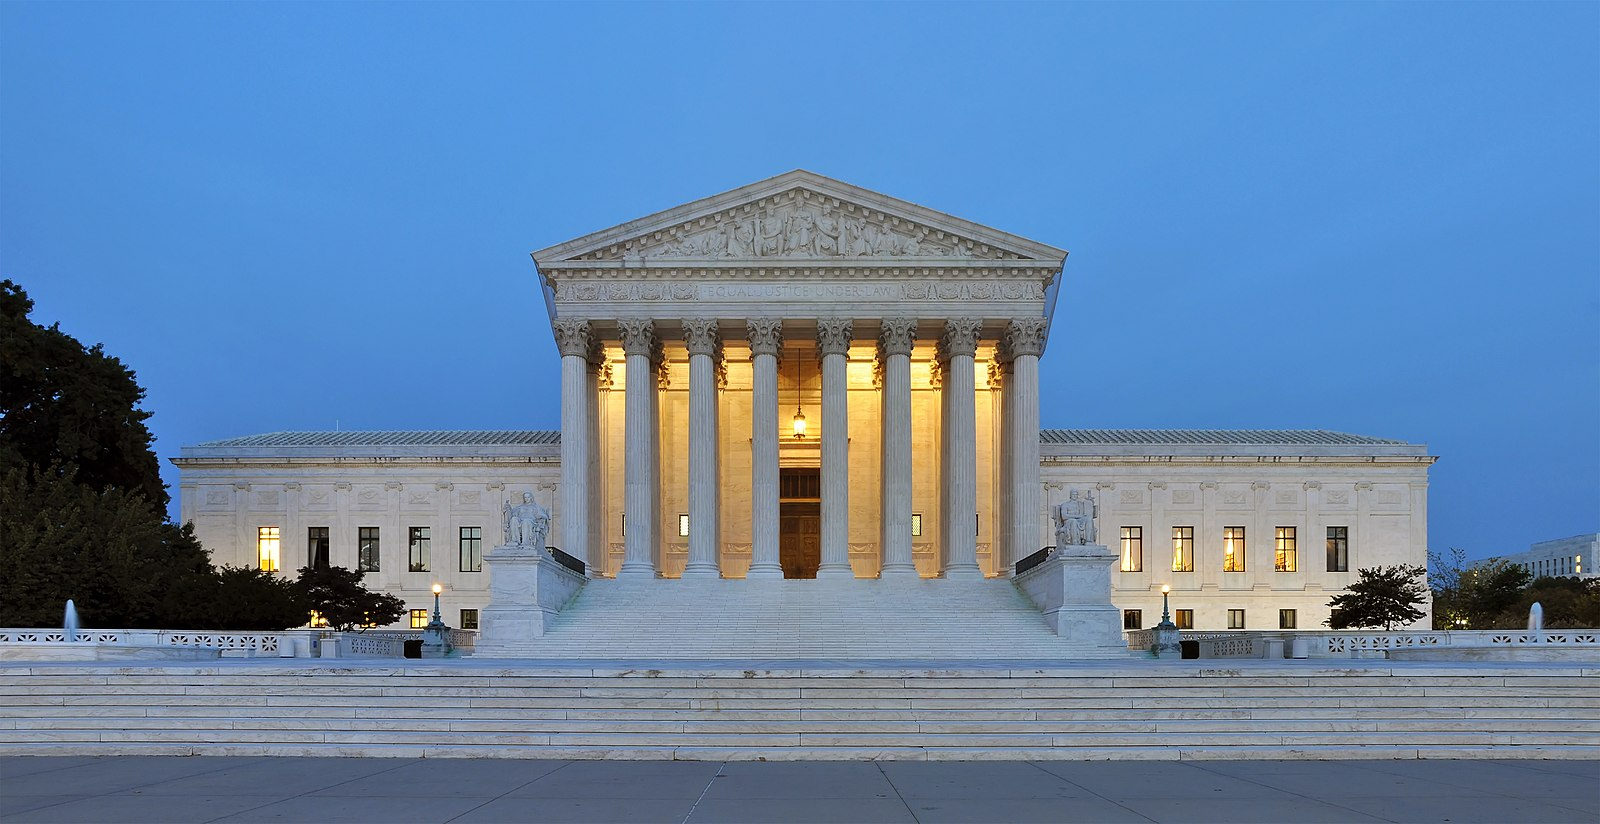 U.S. Supreme Court building exterior